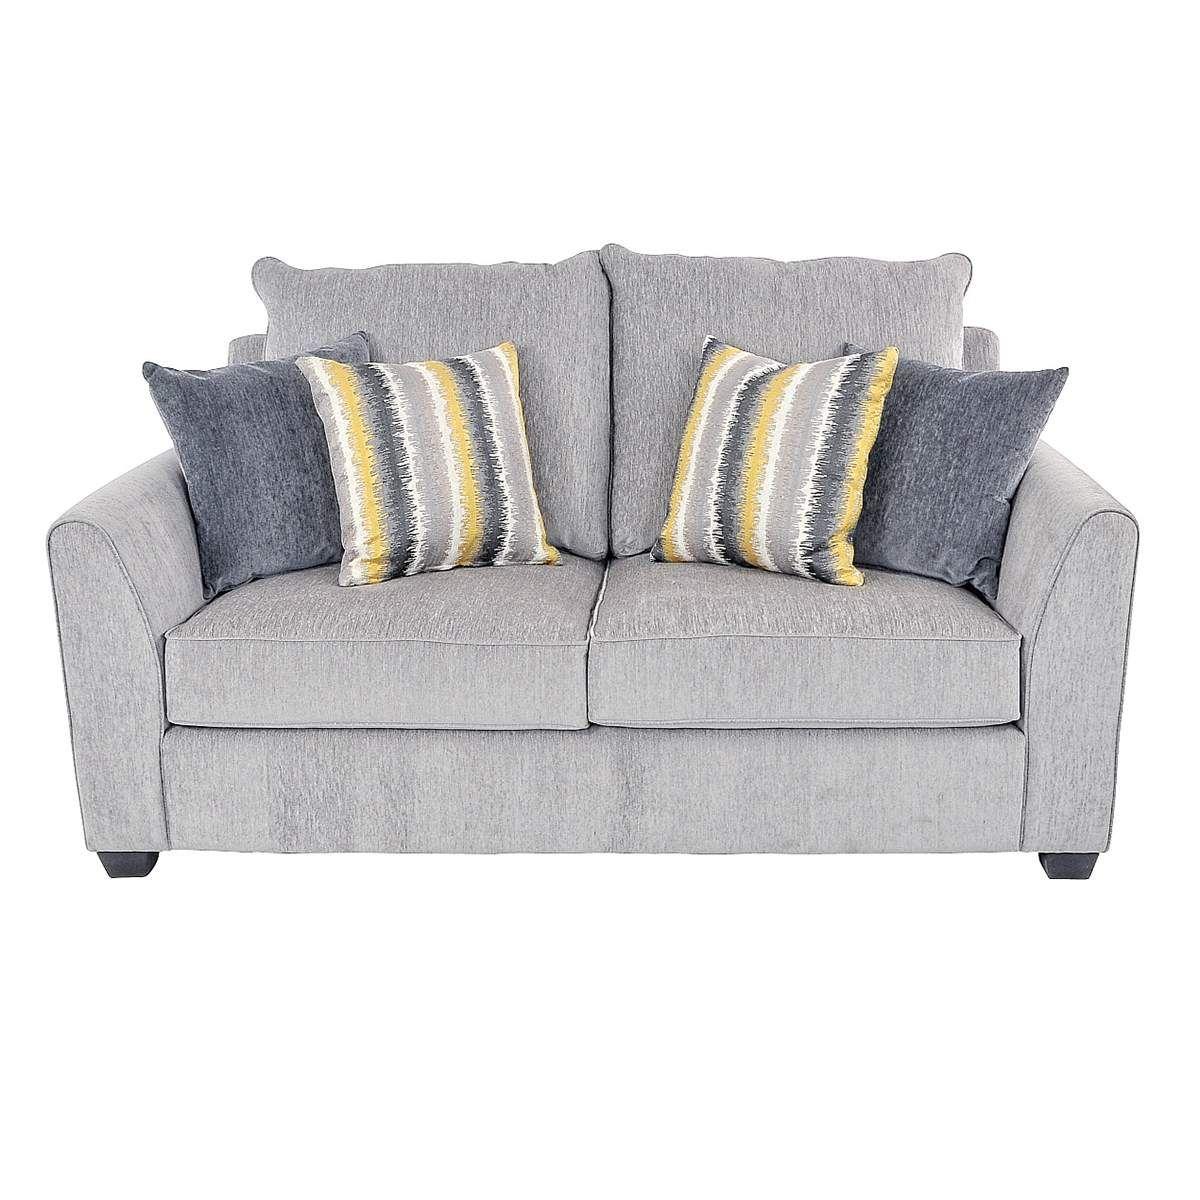 Amazing Zayn Loveseat In Grey In 2019 For The Home Jerome Short Links Chair Design For Home Short Linksinfo